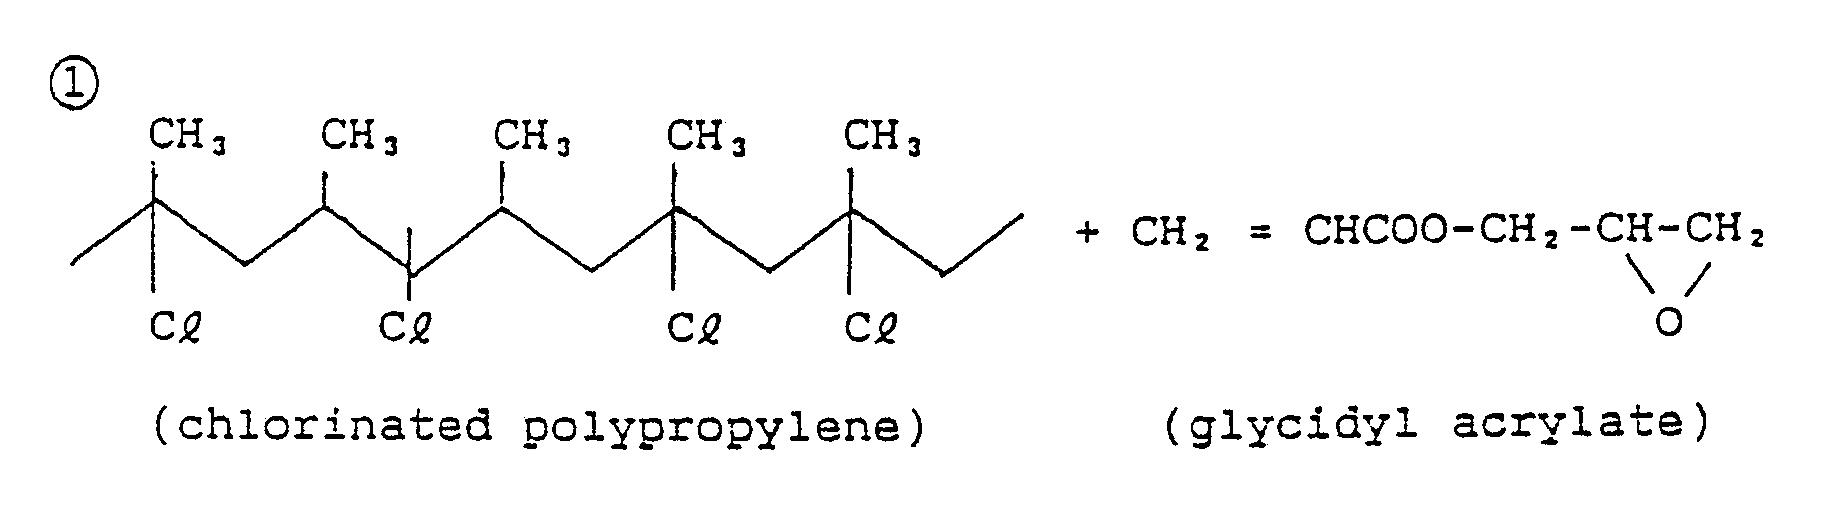 Ep0297555a2 Modified Chlorinated Polypropylene Process